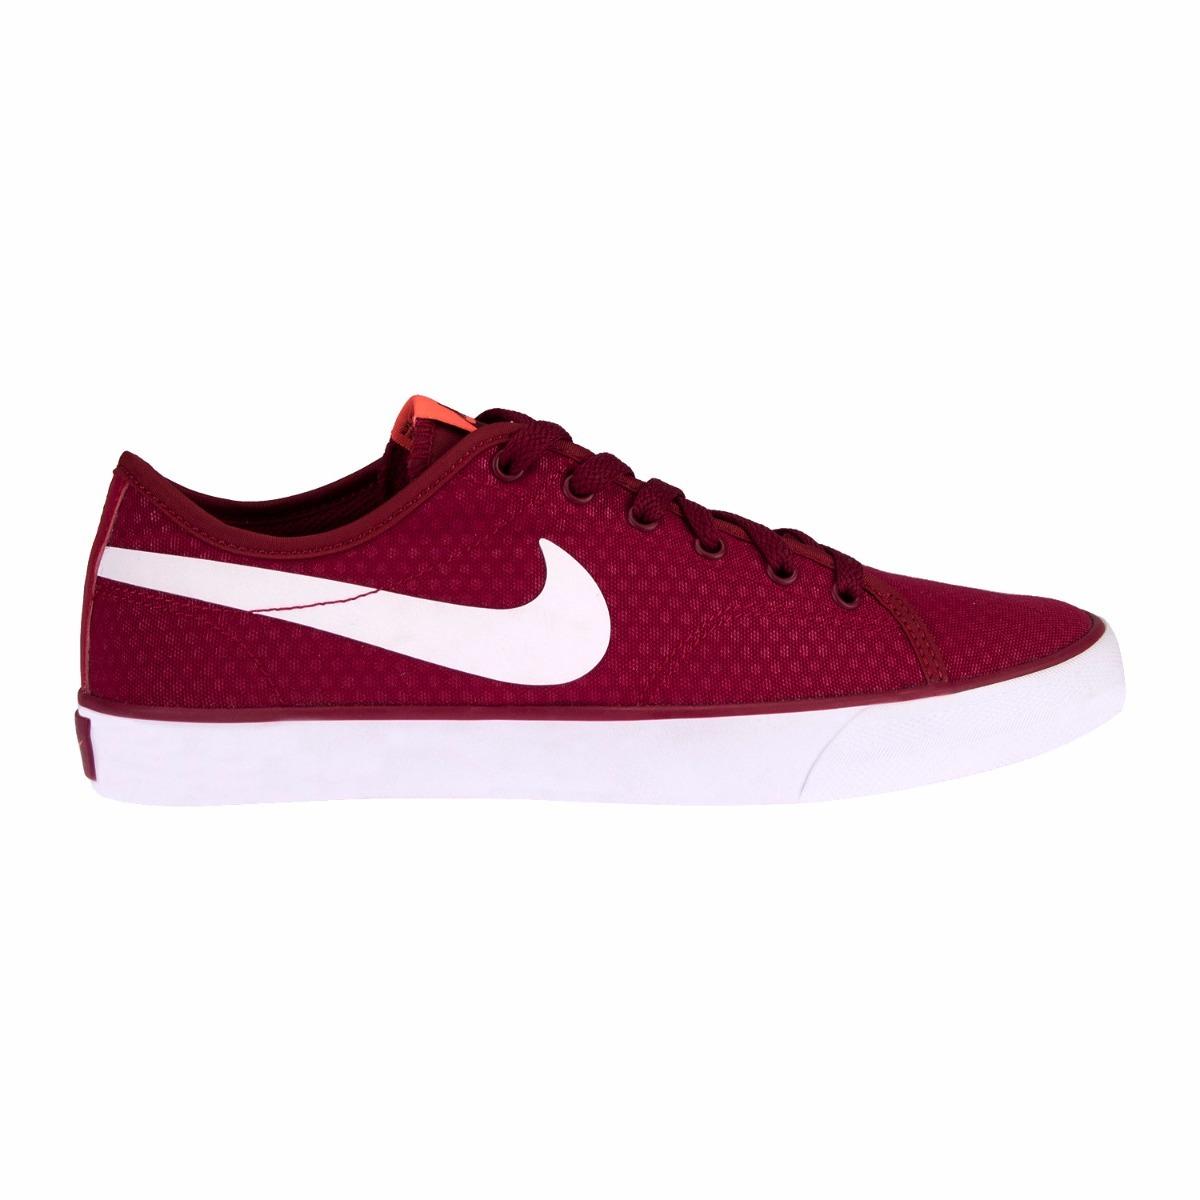 Passarela zapatilla Nike 631635 610 (5 8*) Primo Court